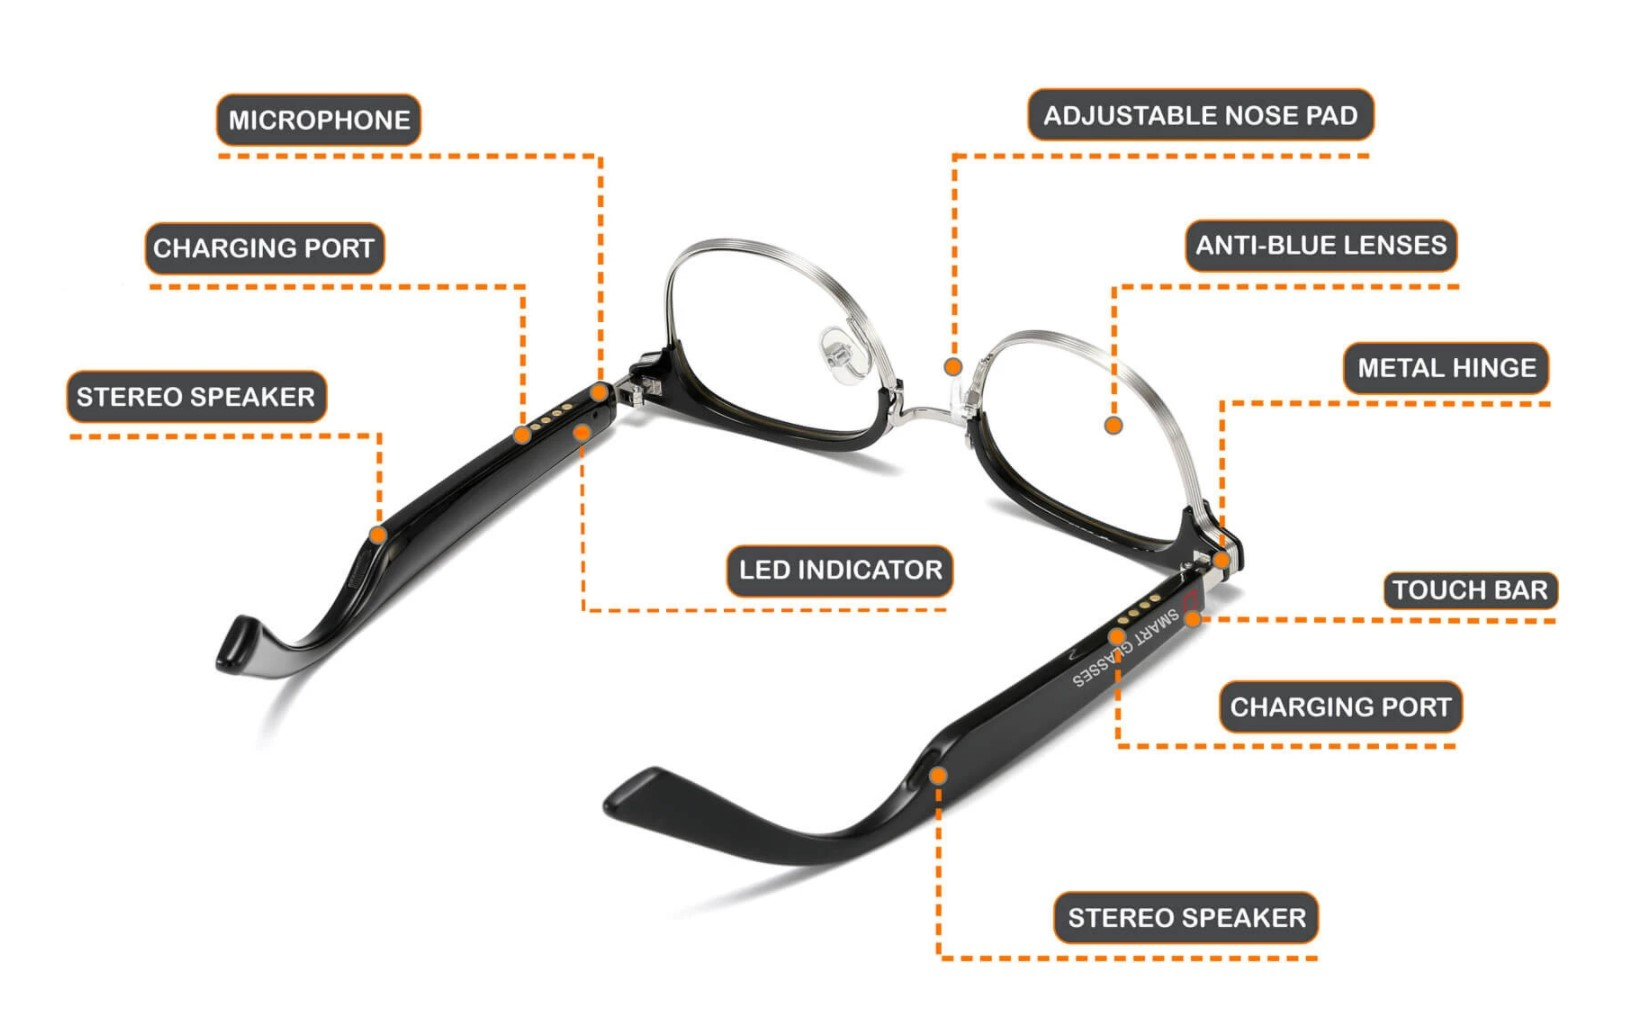 Corsca Bluetooth sunglasses